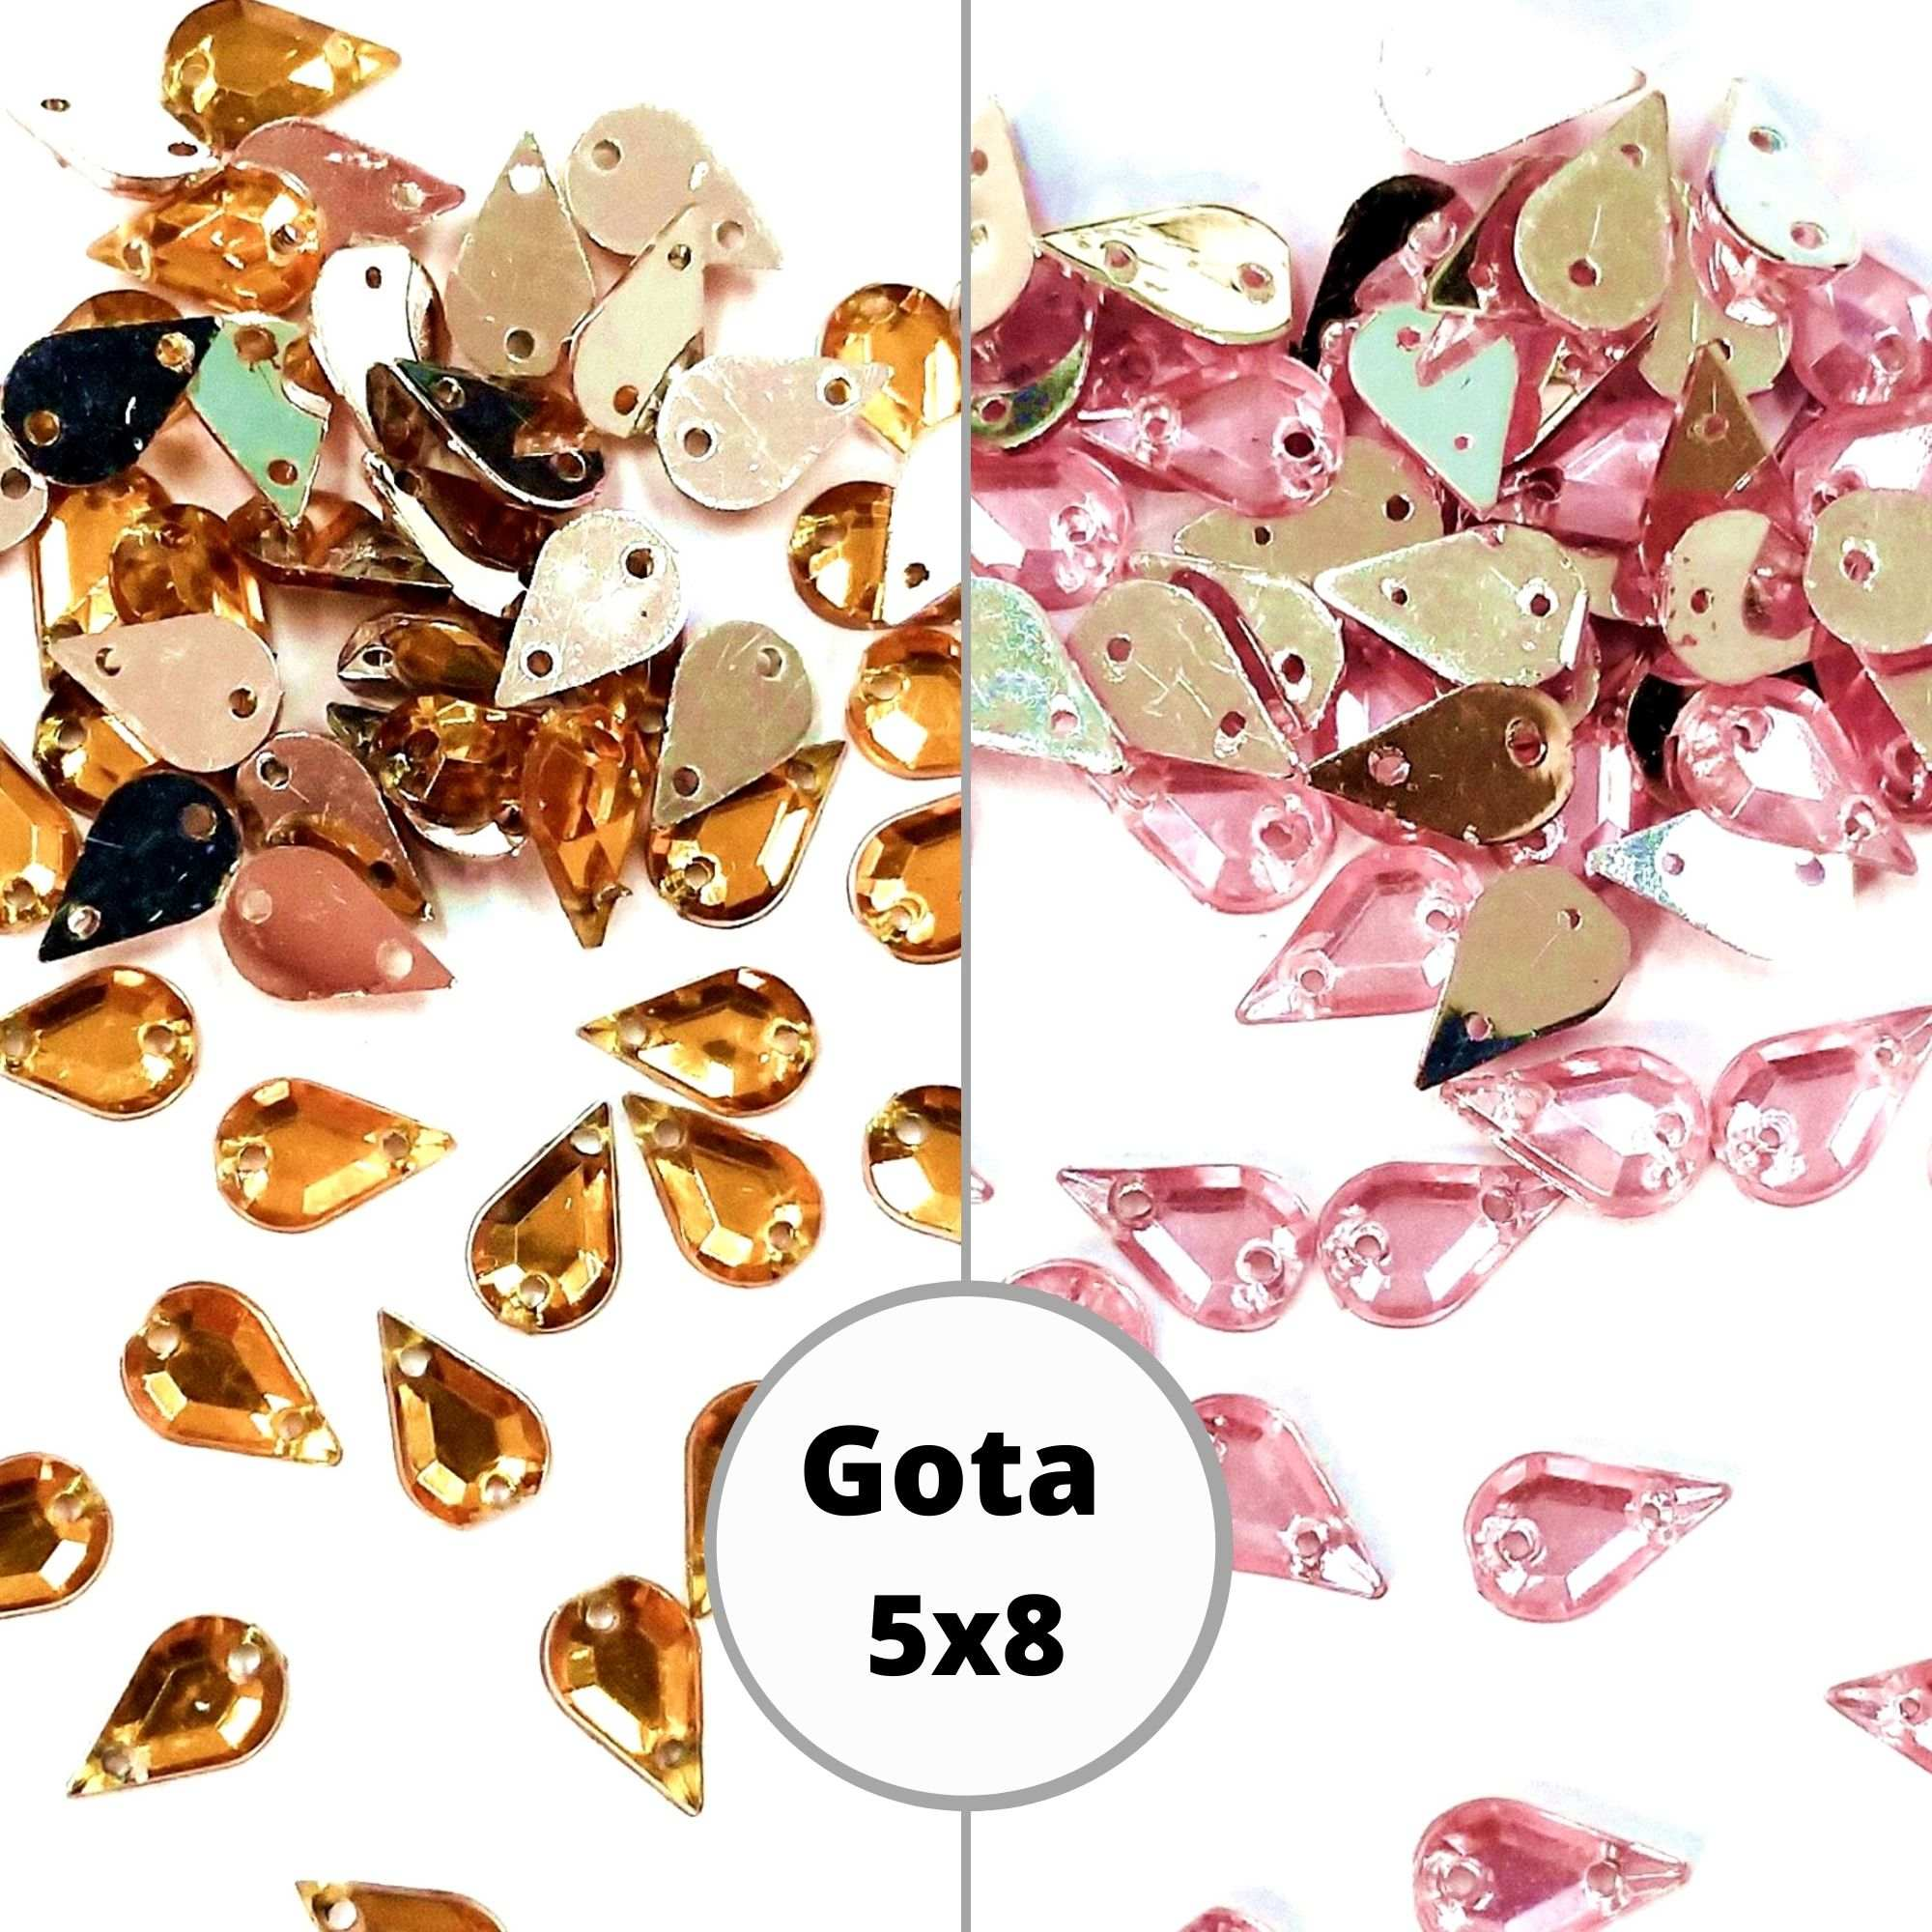 Chaton Gota 5x8 - Pacote com 200 unidades